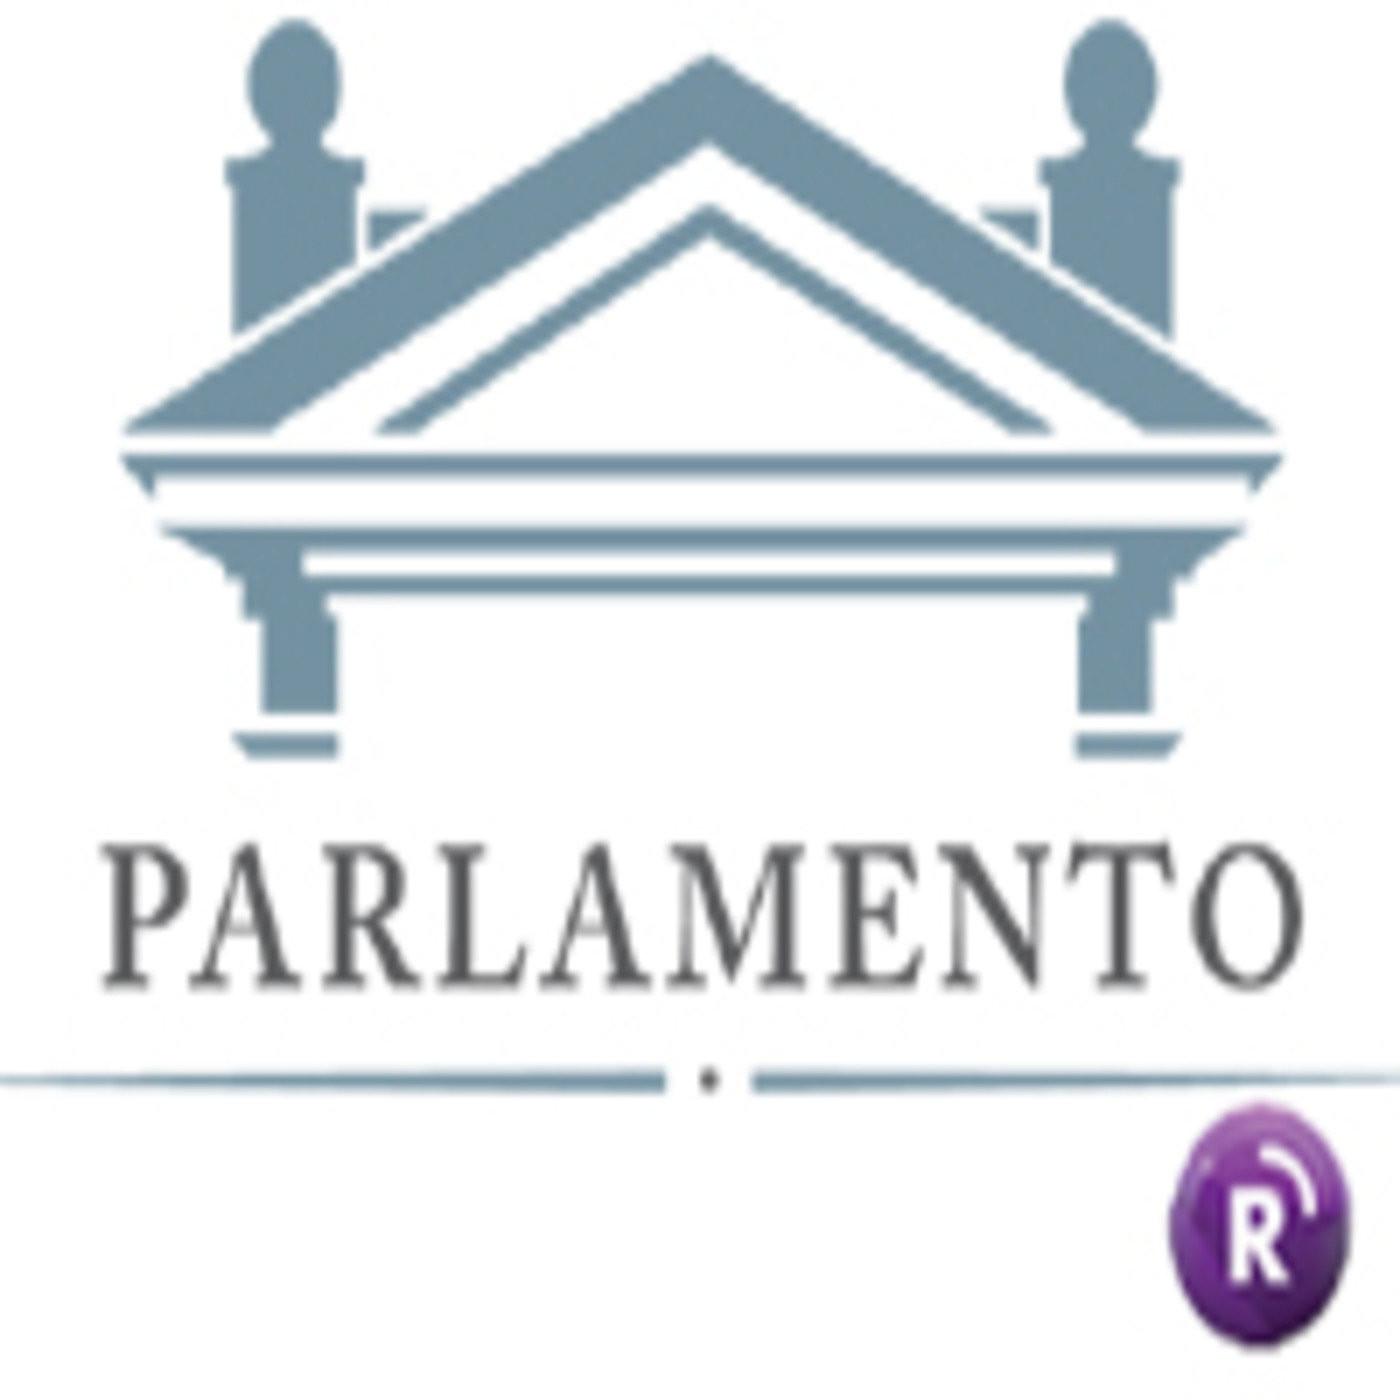 <![CDATA[Parlamento]]>